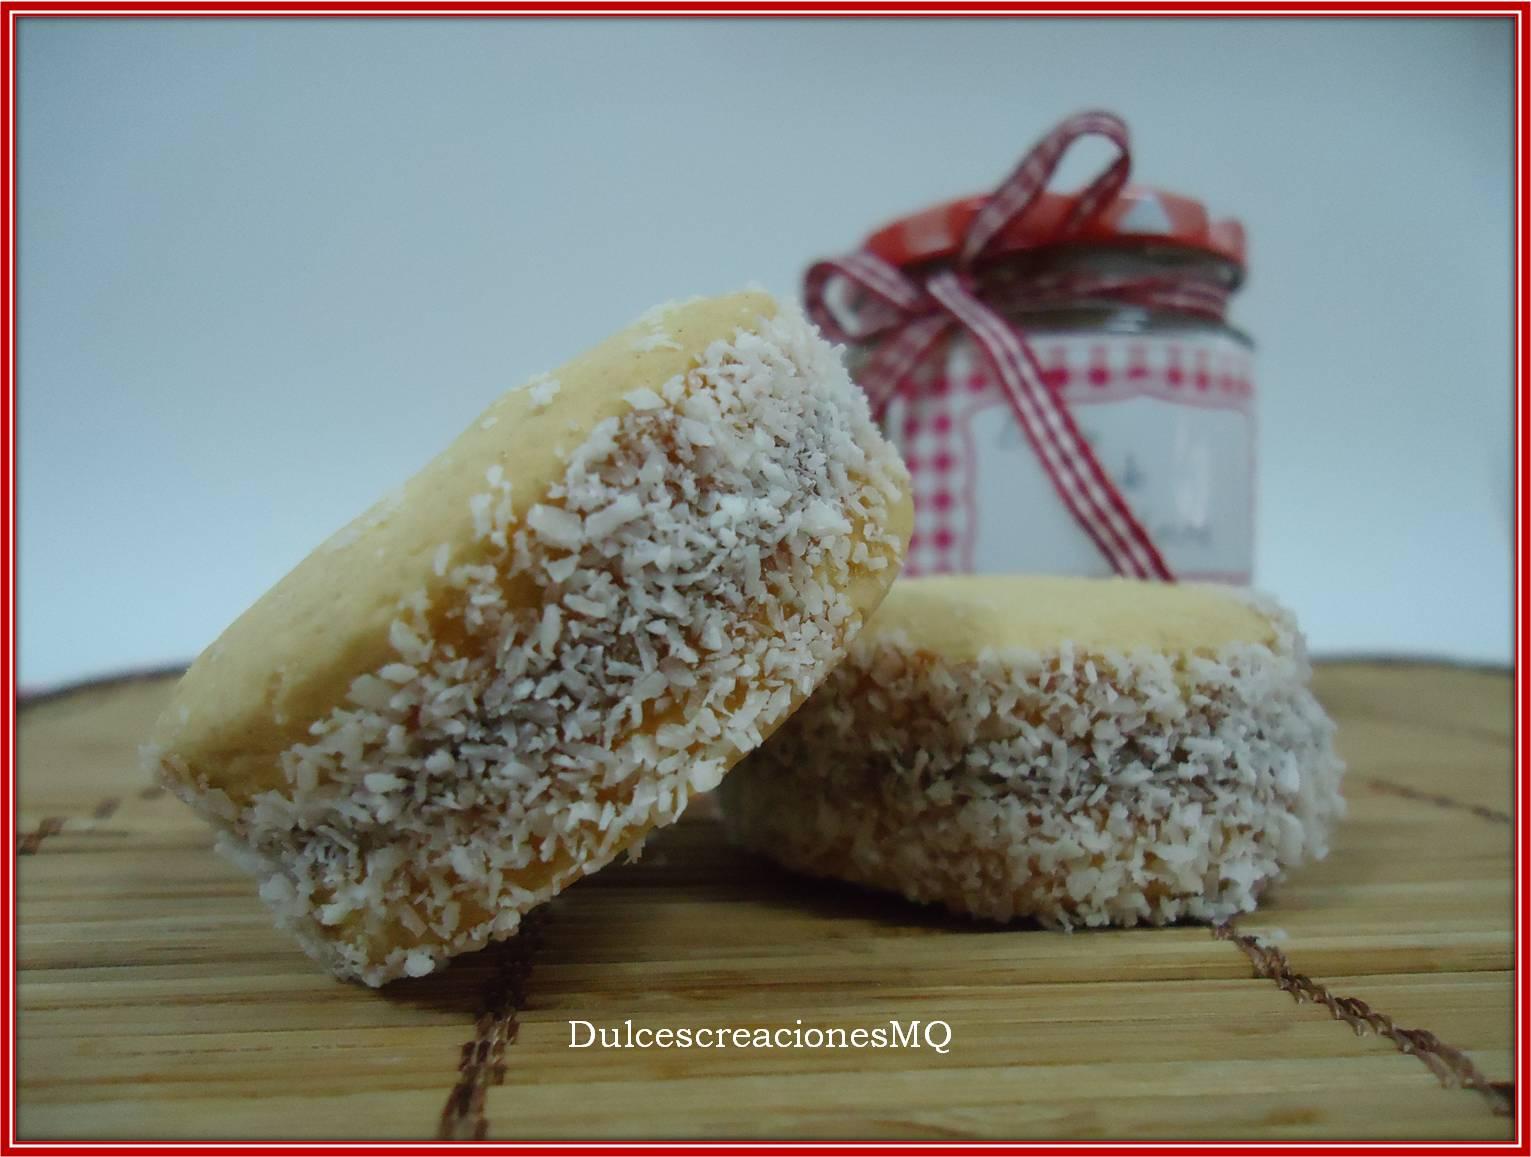 Alfajores de Dulce de Leche Coco Maizena Fécula de maíz Postres Casero Argentino Cumpleaños